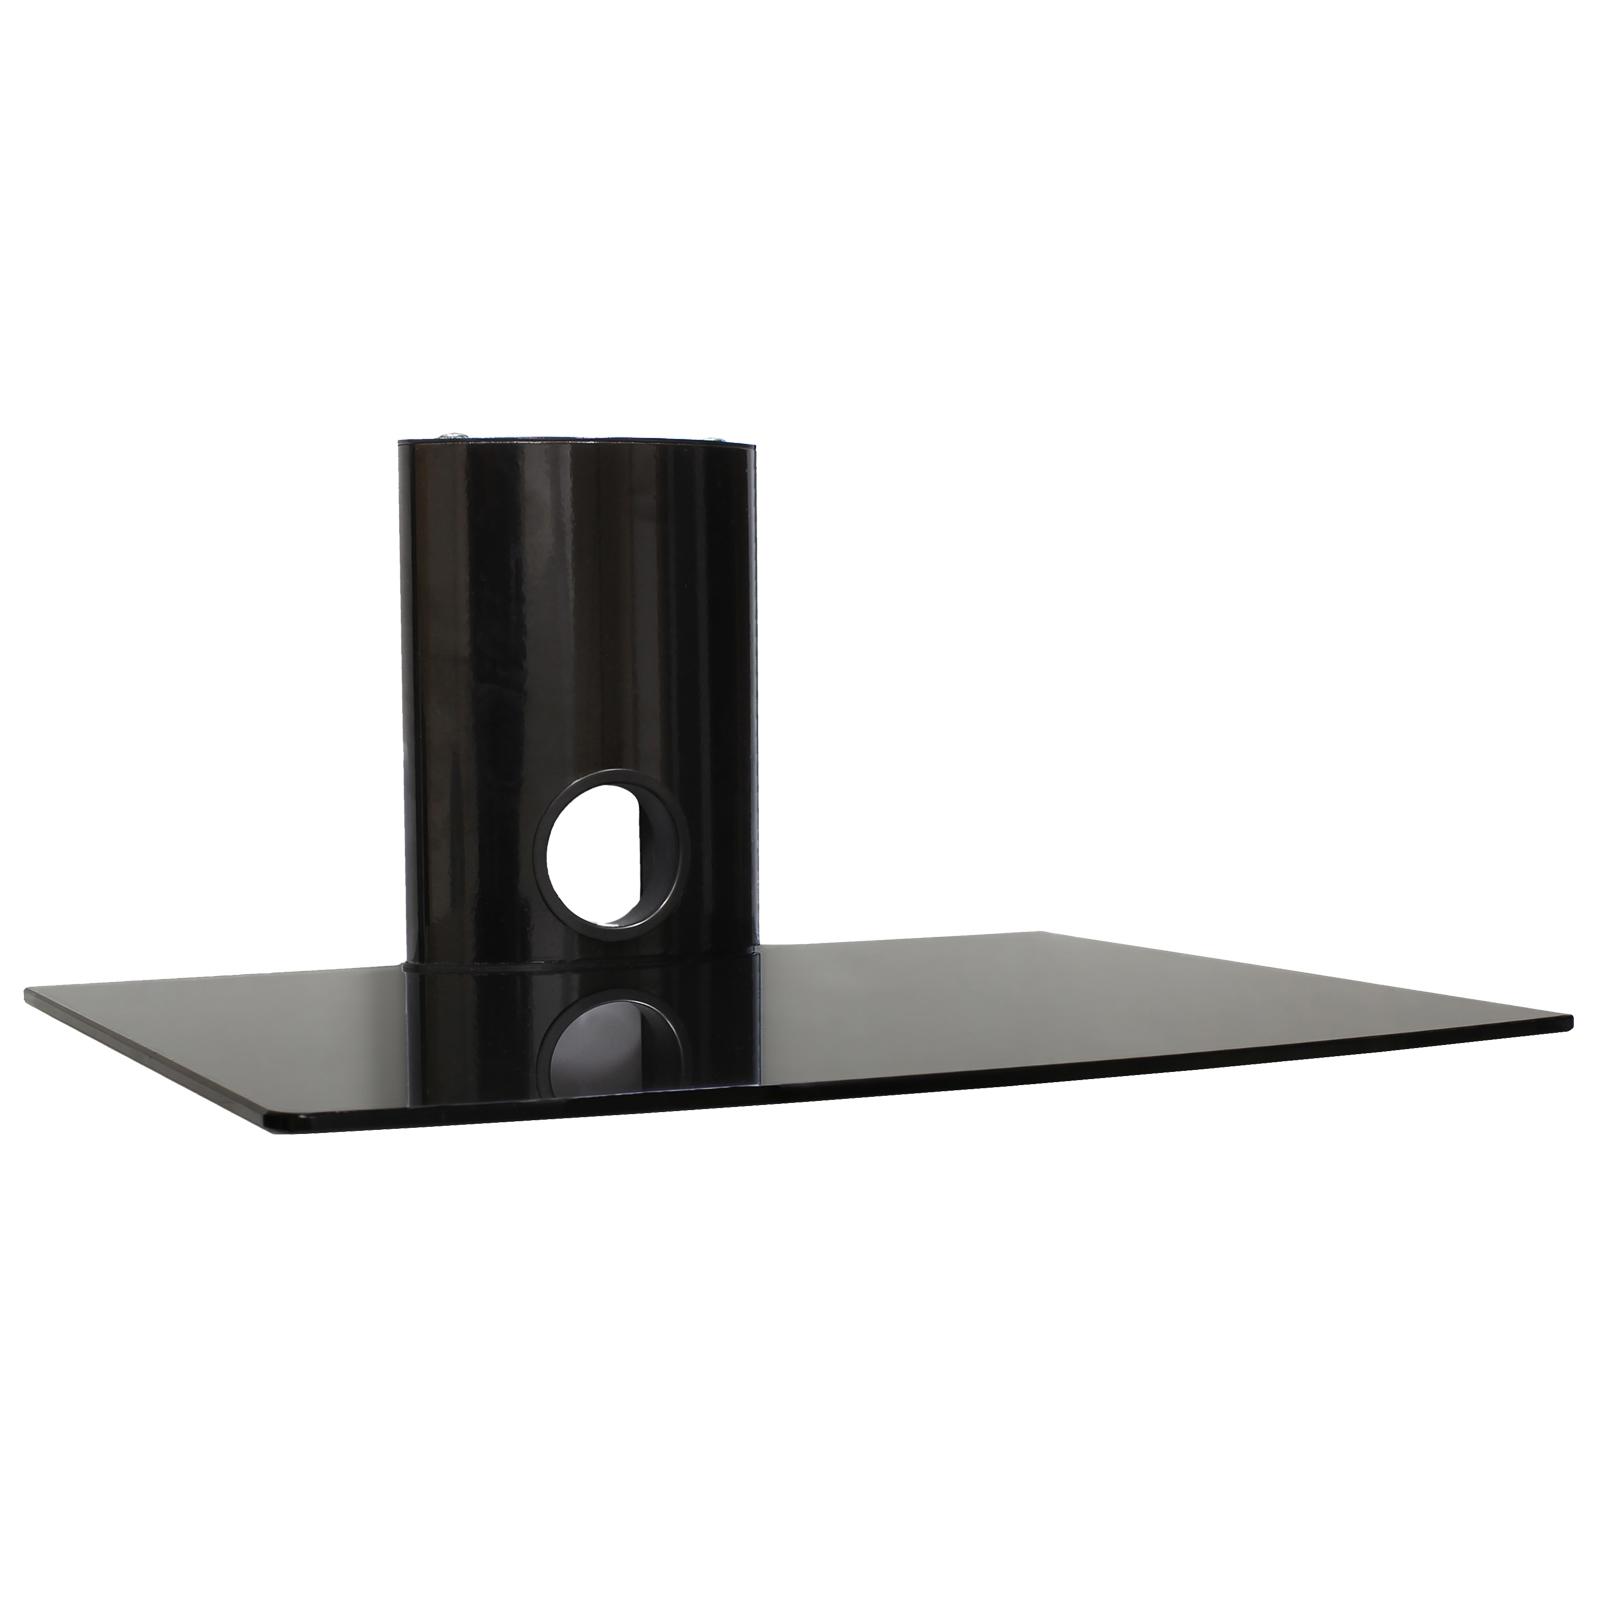 Diy Glass Floating Shelves Home Decorations With Regard To Black Glass Floating Shelves (View 8 of 12)